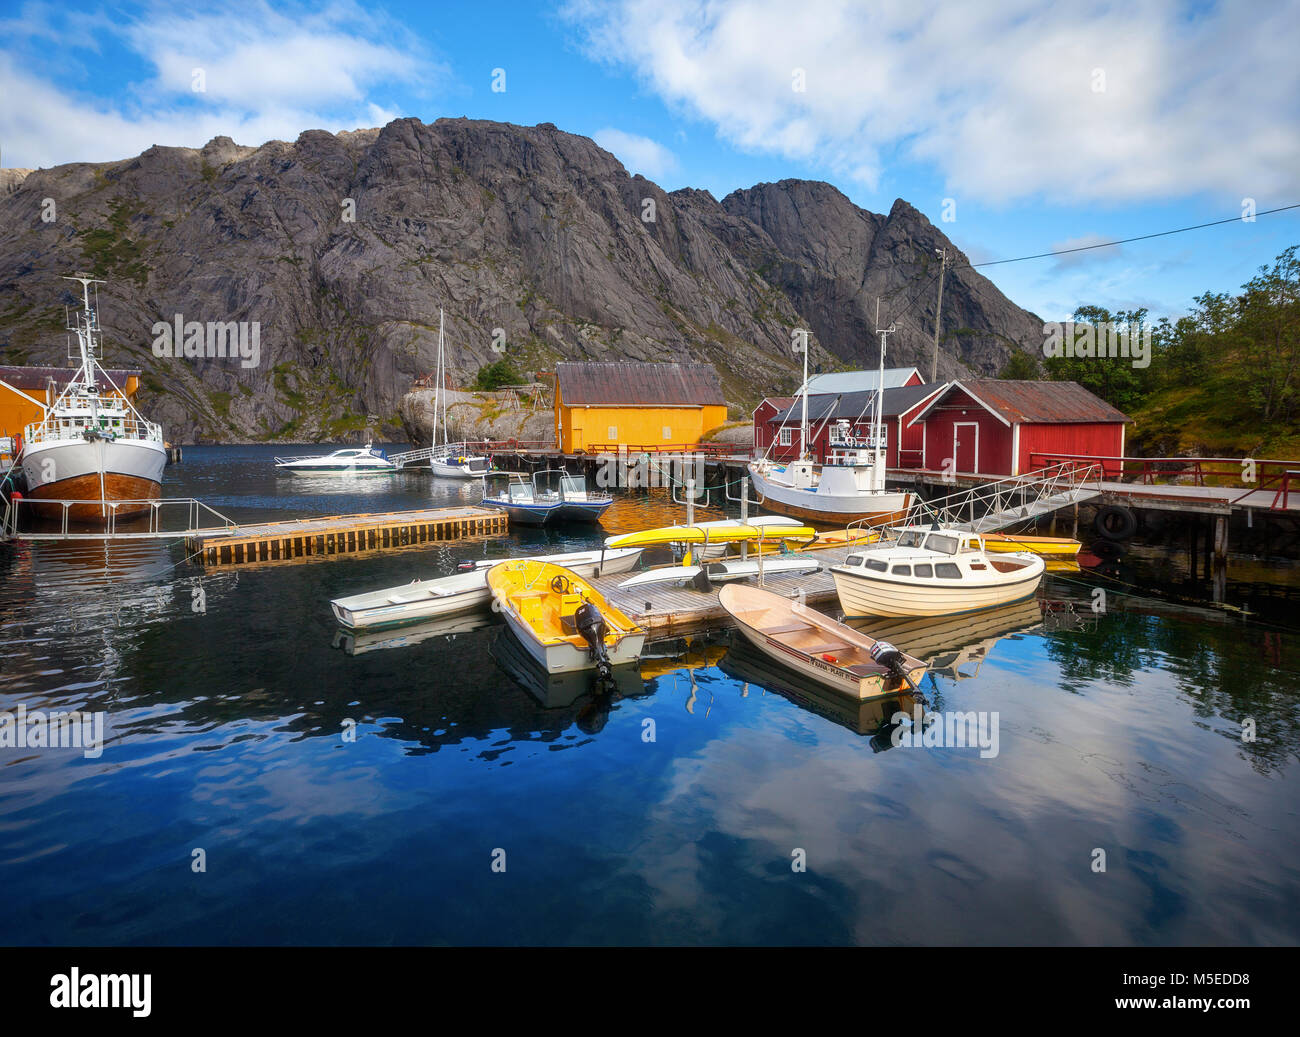 Nusfjord Fishing Villange in Norway - Stock Image